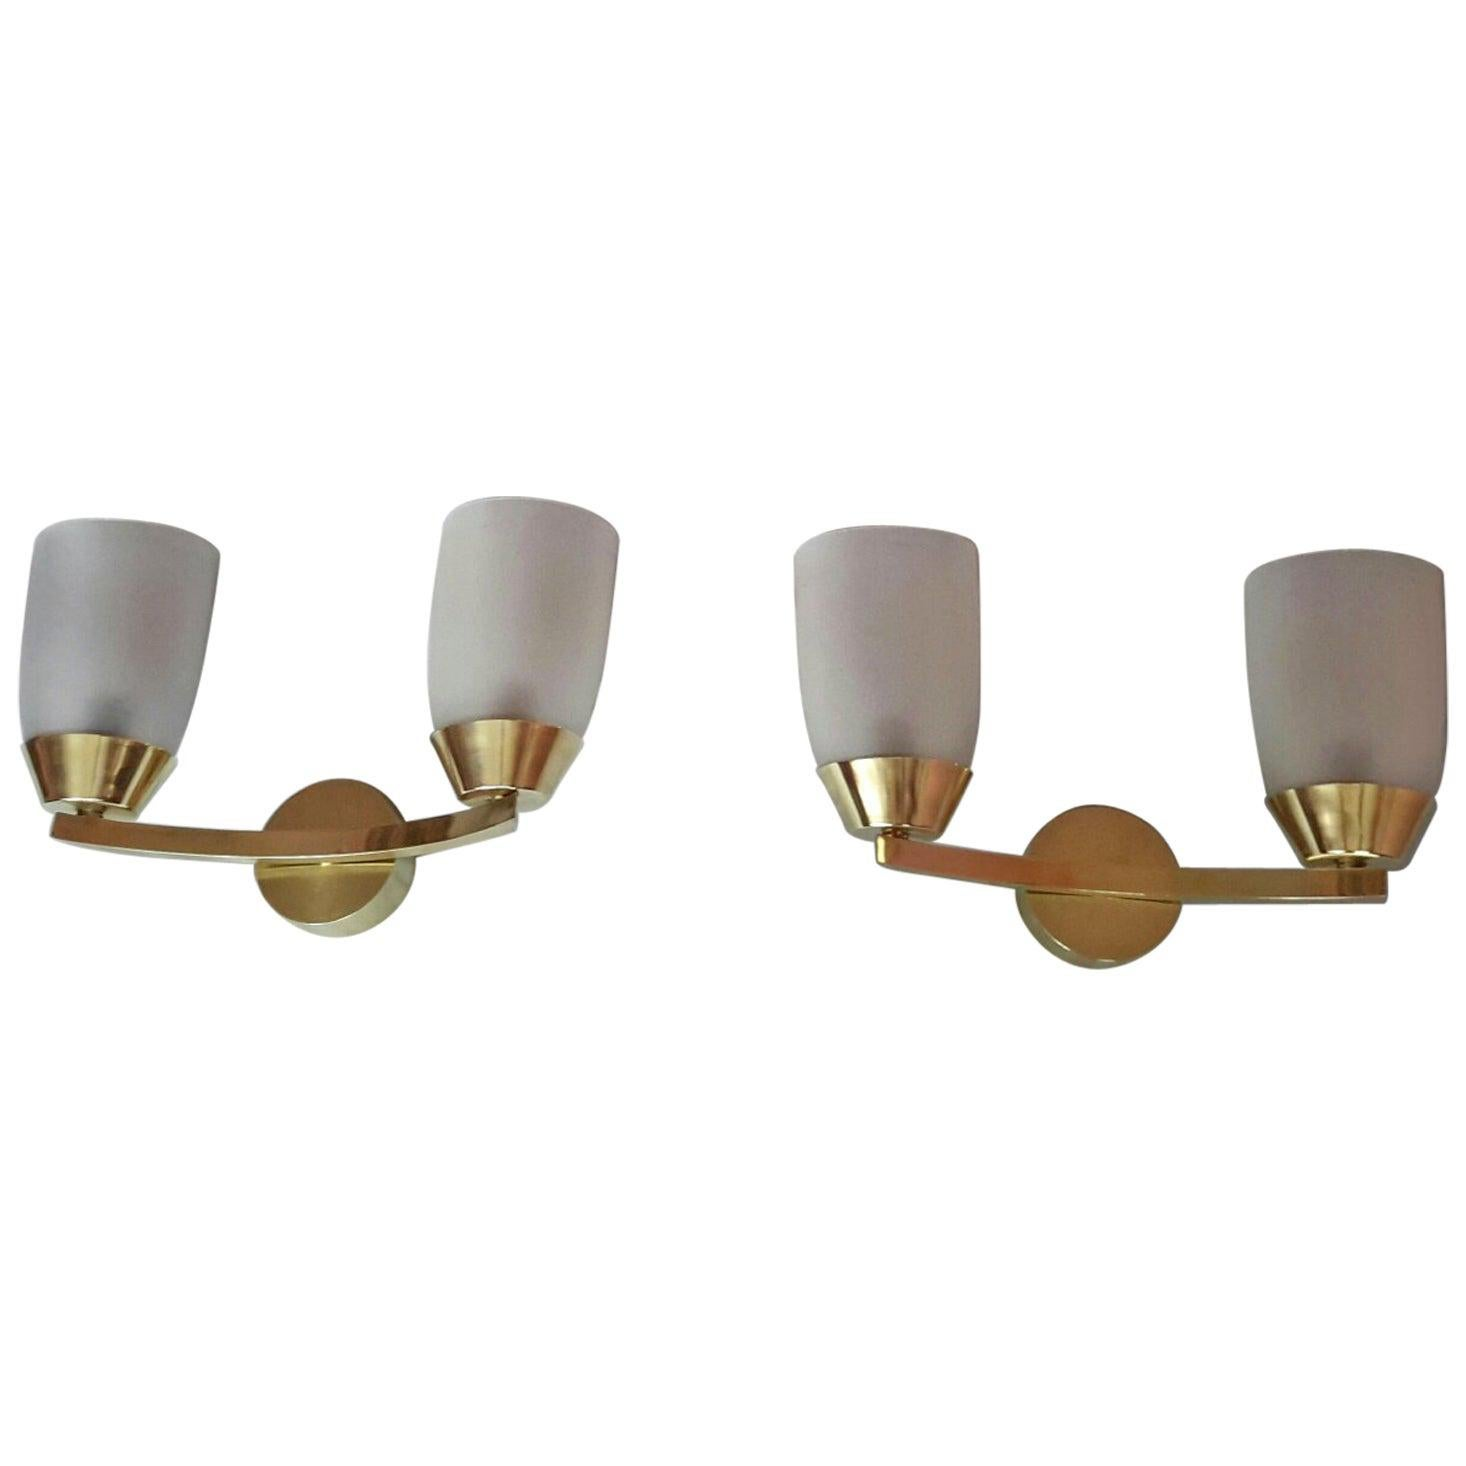 Jean Perzel Style Mid-Century Modern Brass Sconces, France, 1950